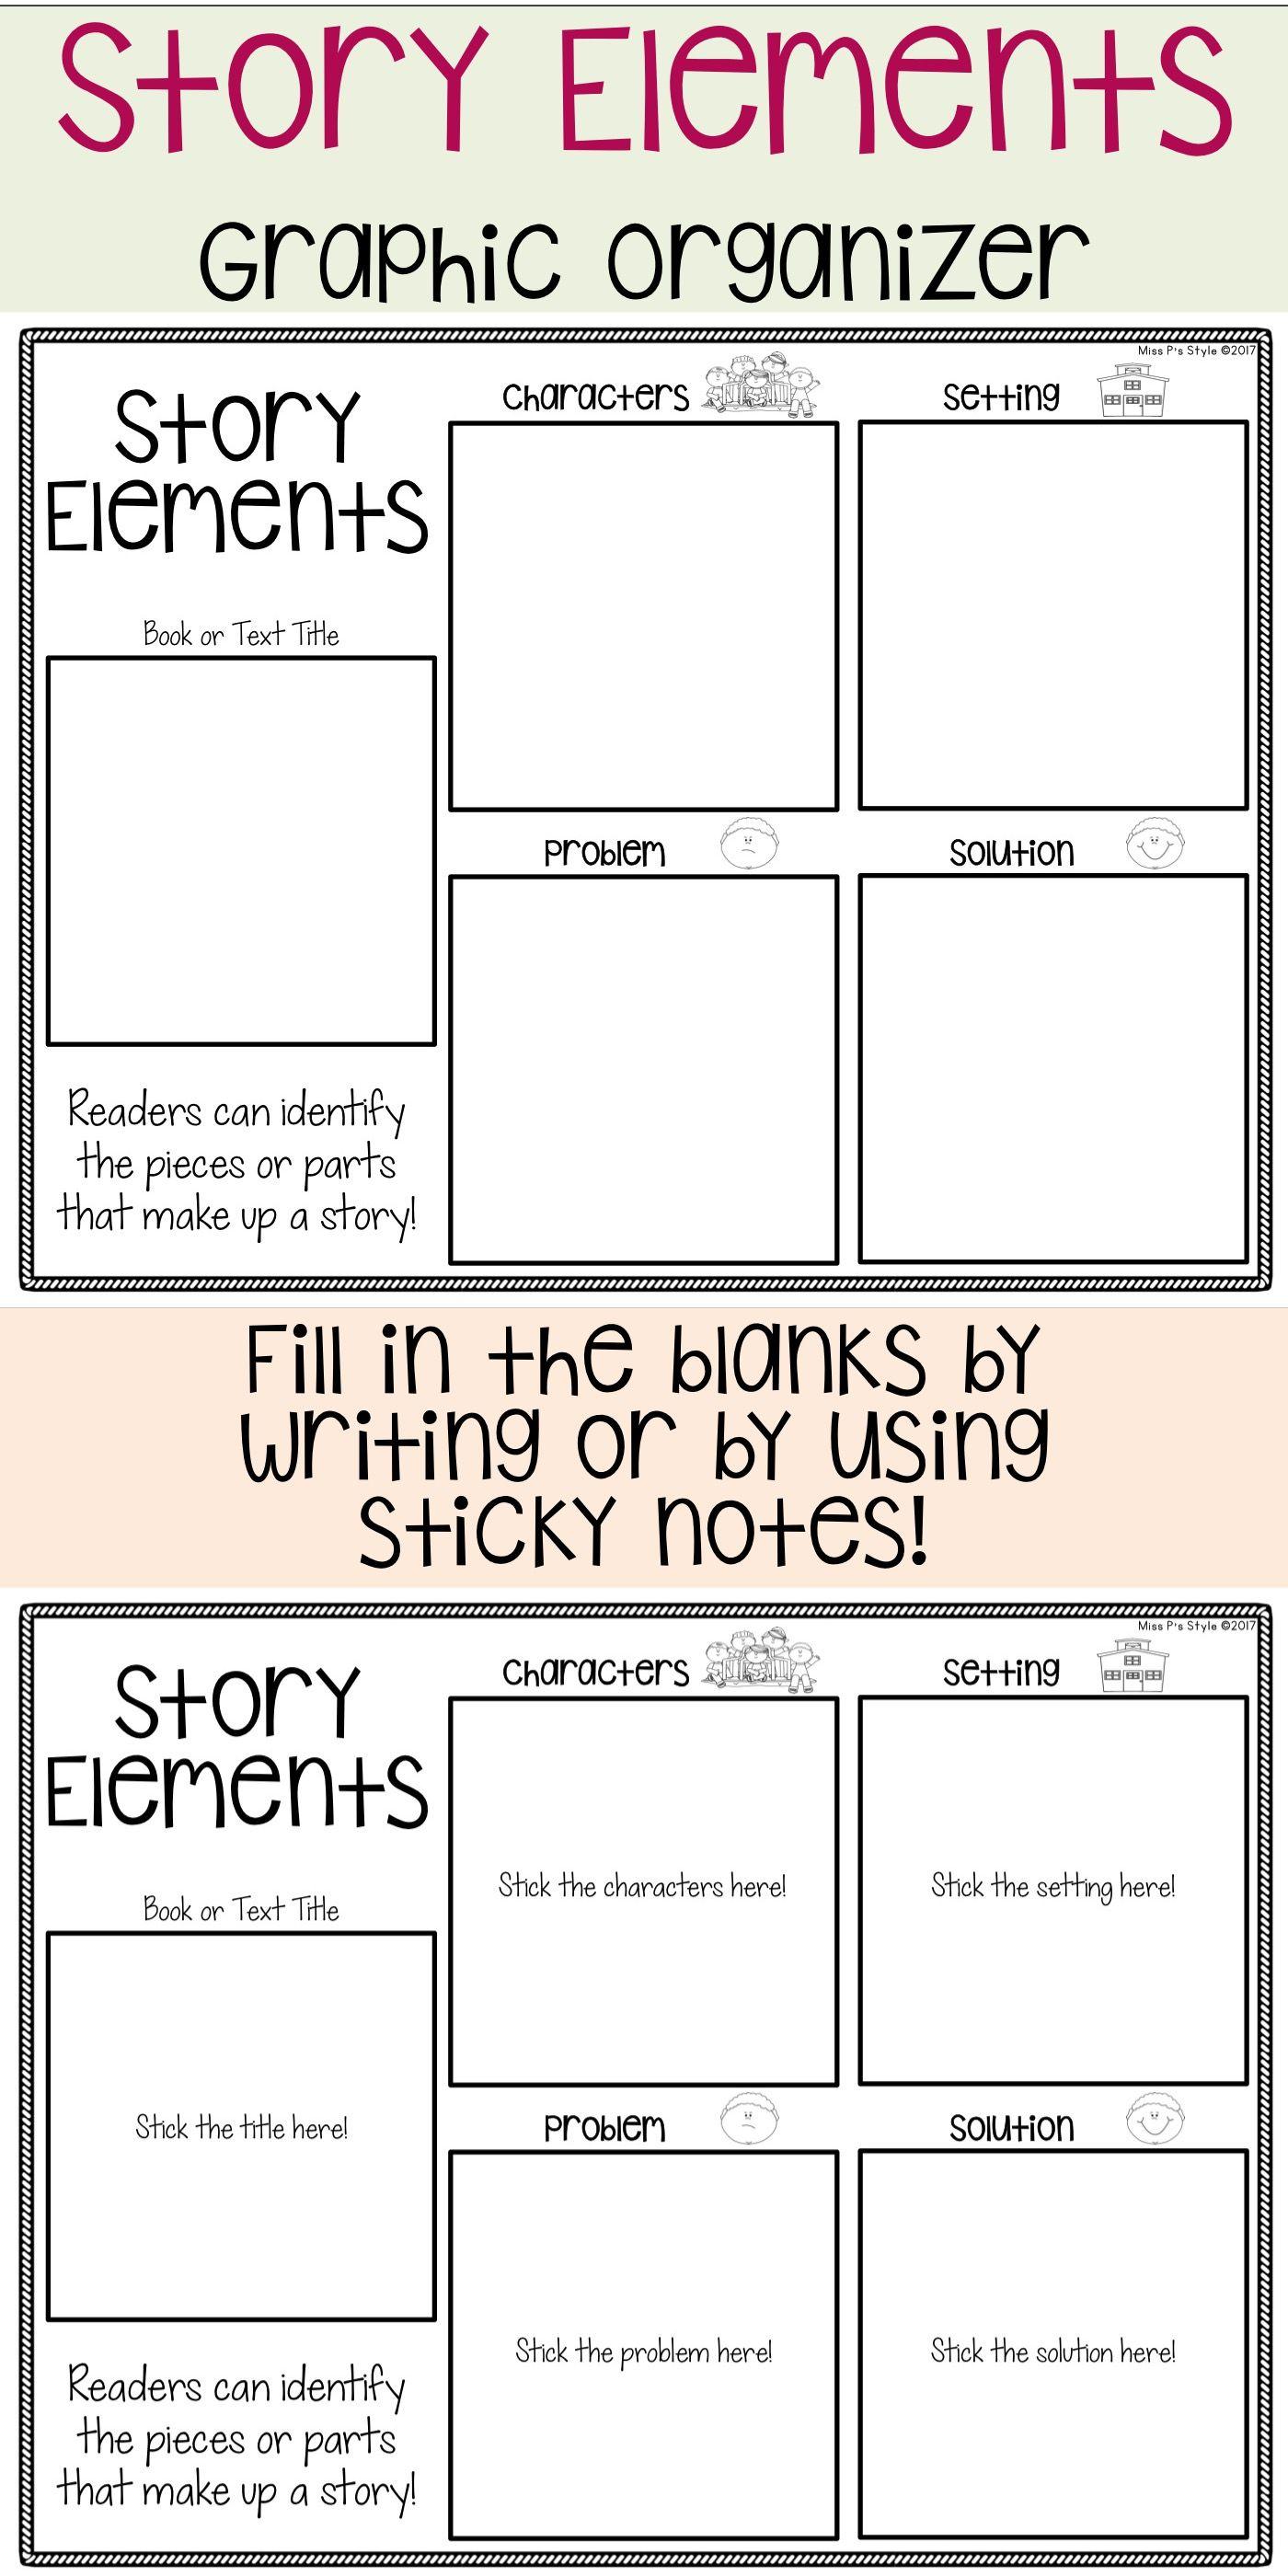 Story Elements Graphic Organizer Reading Graphic Organizers Graphic Organizers Comprehension Graphic Organizers